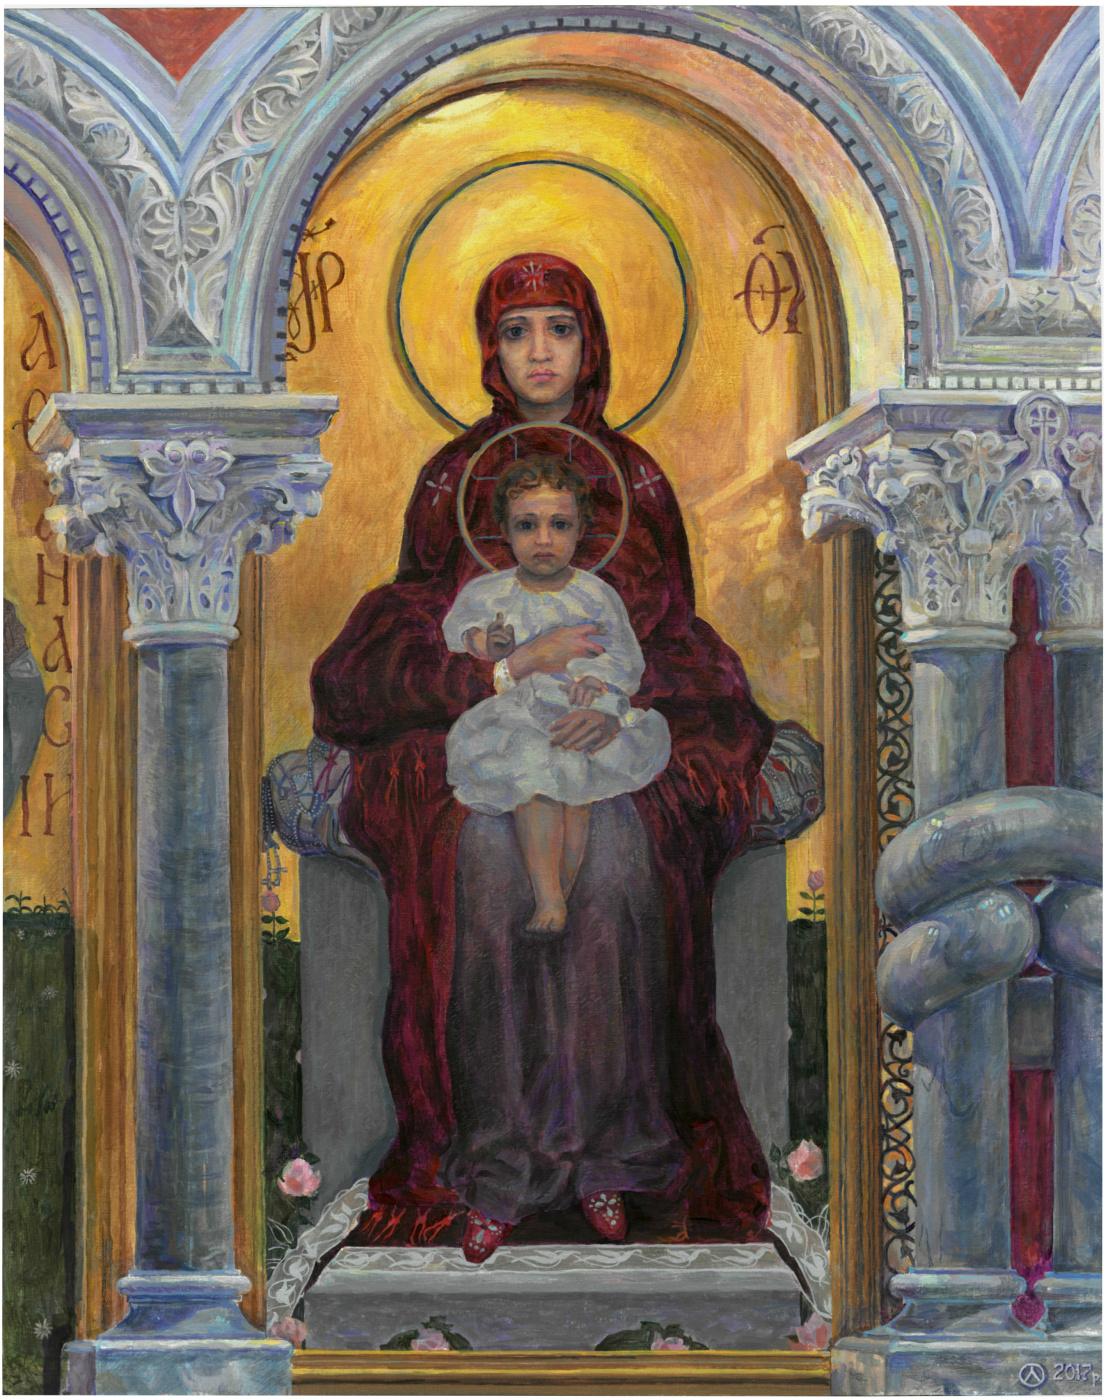 Oleg Mikhailovich Litvinenko. Fragment of the iconostasis of the Cyril Church. Virgin Mary with the Children. (Vrubel M.)